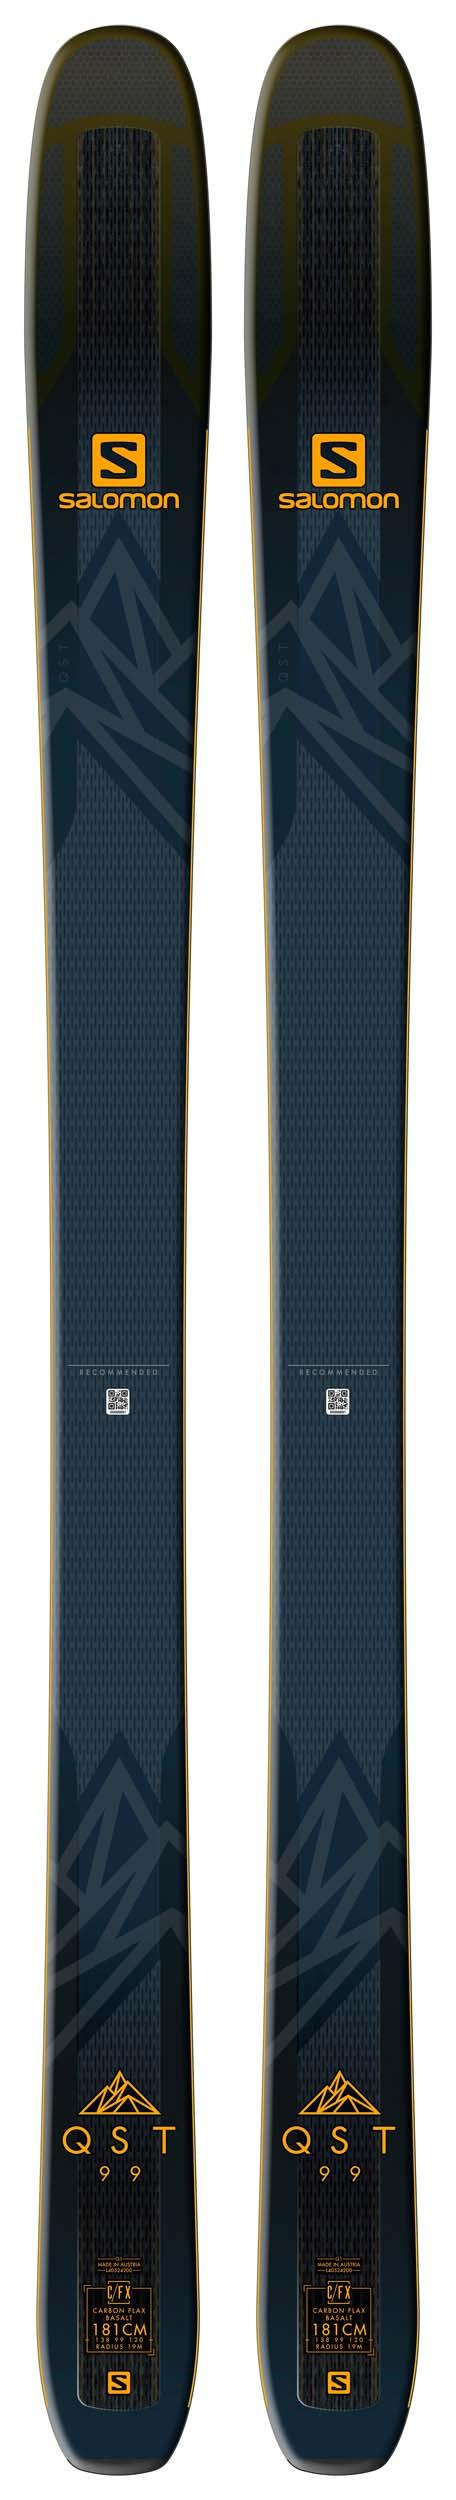 Salomon 2019 QST 99 Skis (Without Bindings / Flat) NEW !! 174,181,188cm